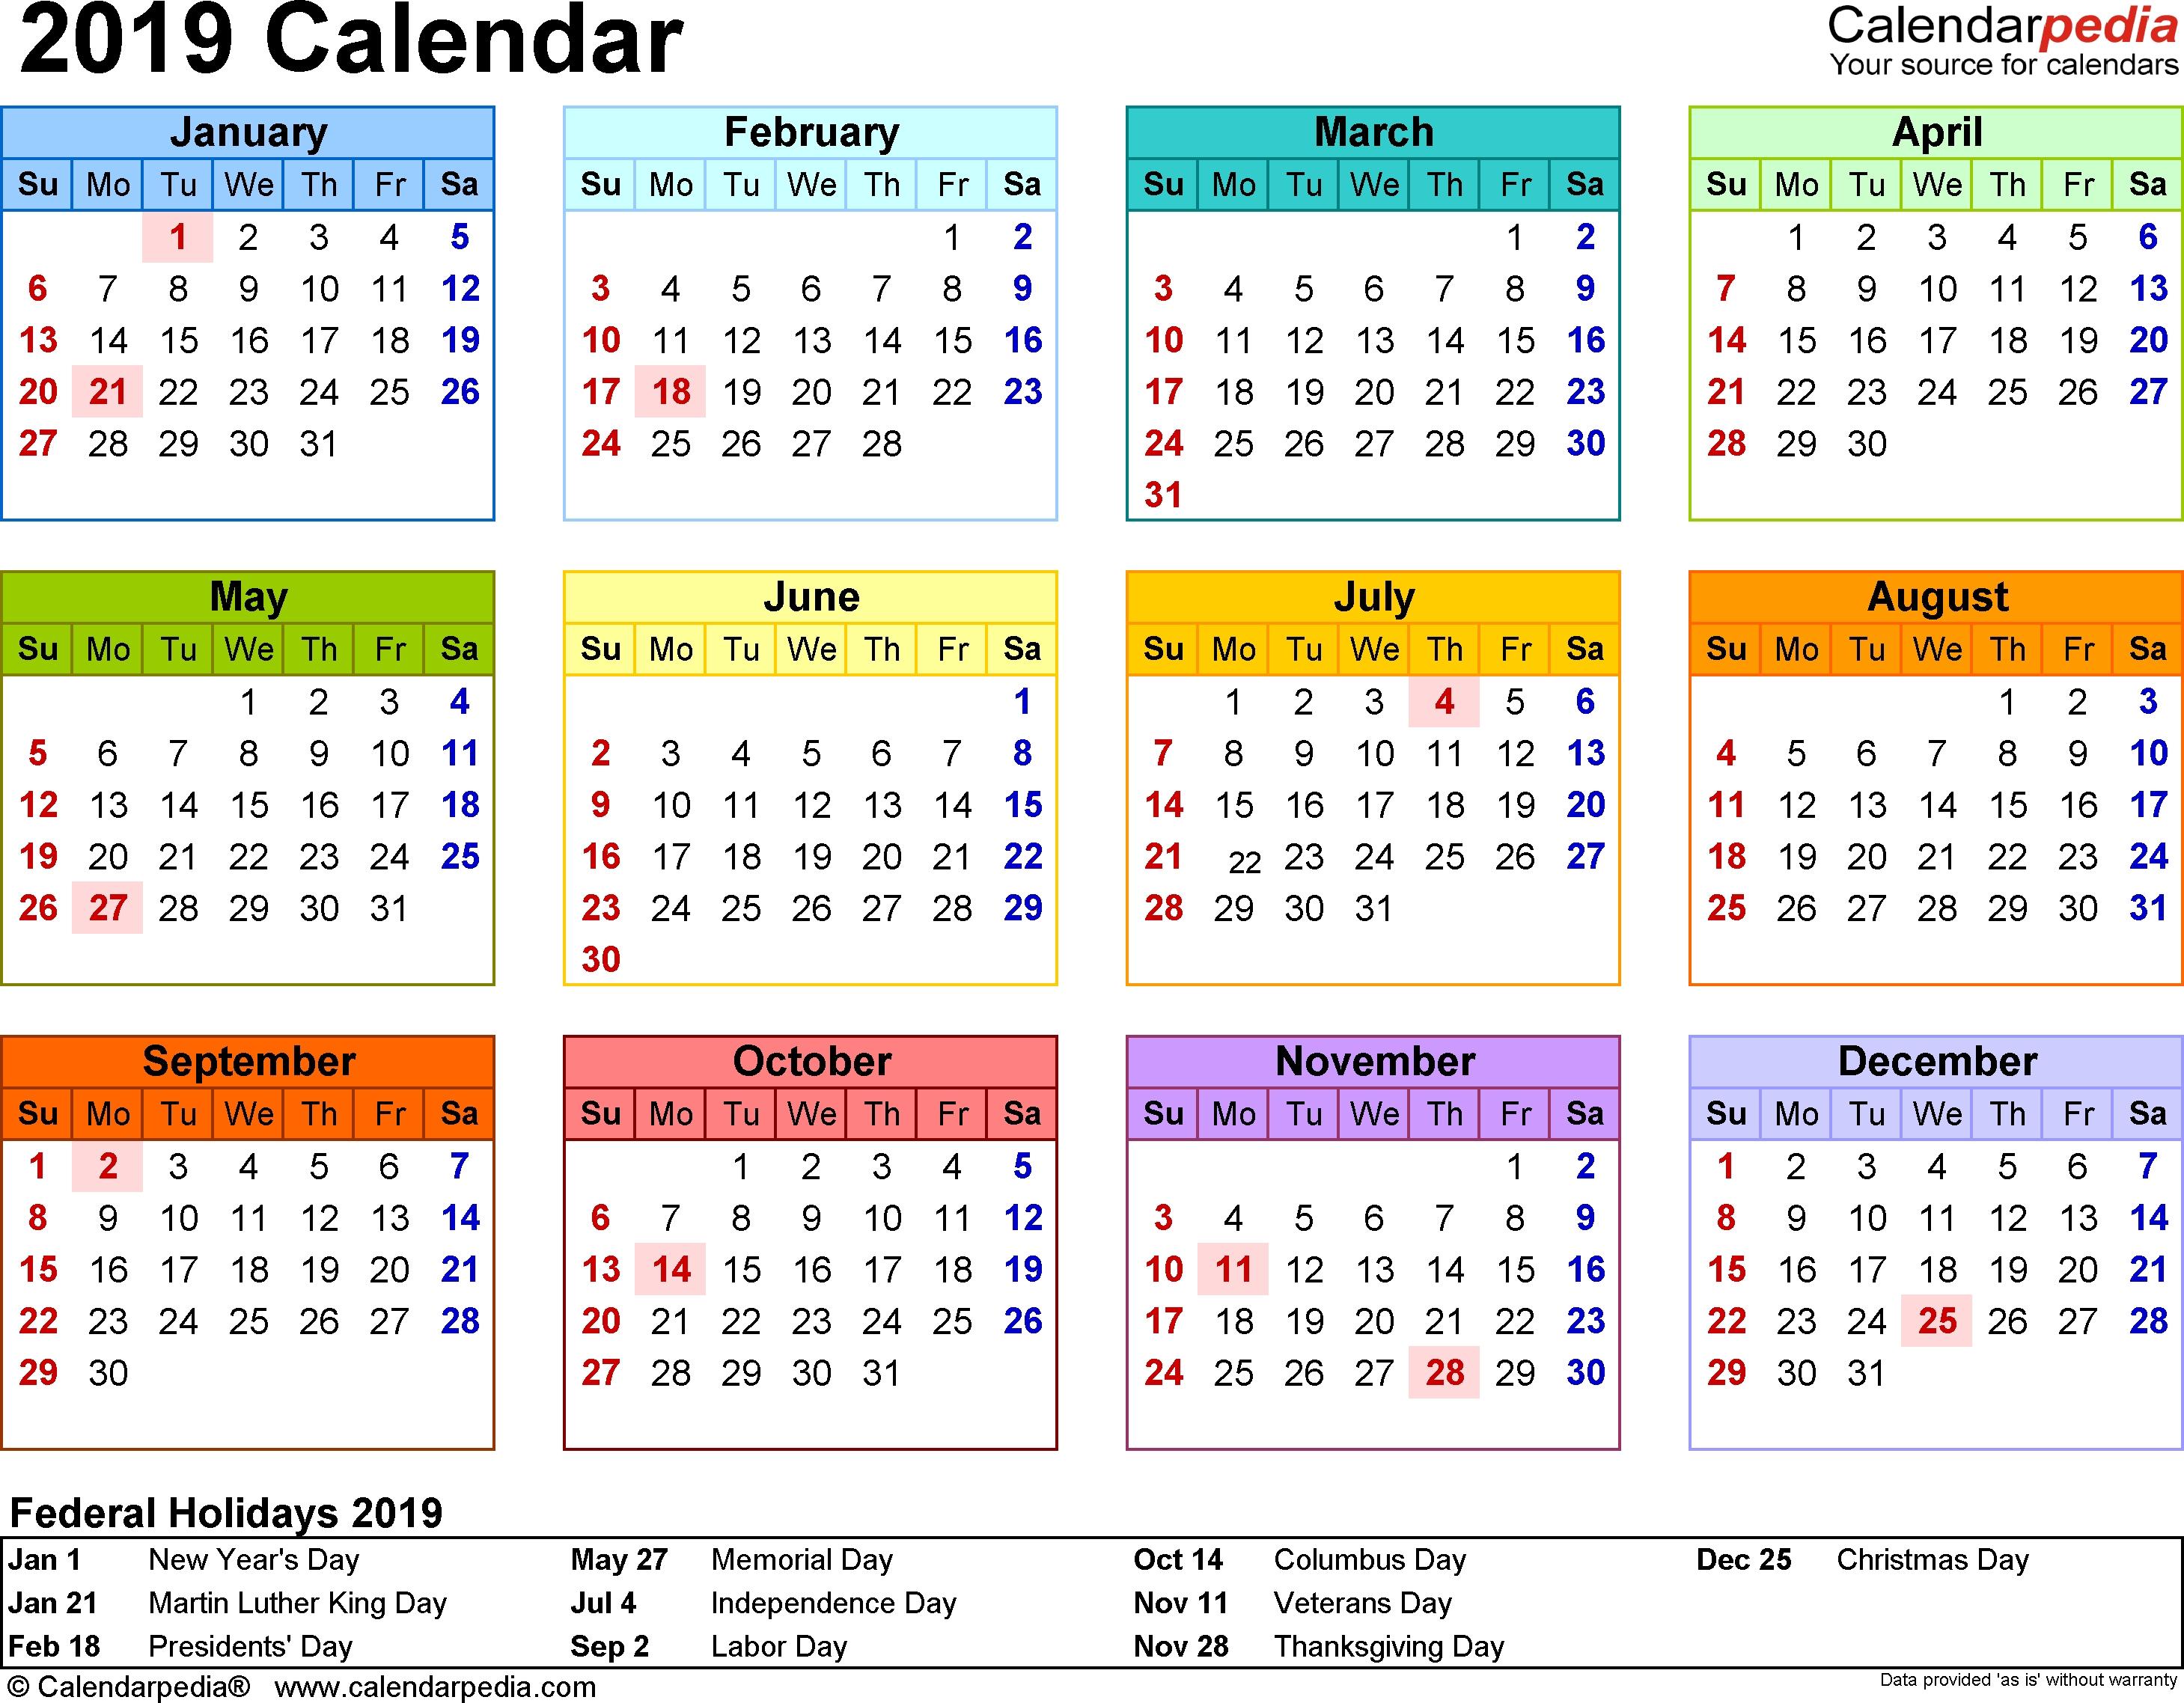 2019 Calendar - 17 Free Printable Word Calendar Templates intended for 12 Month Calendar Word Template